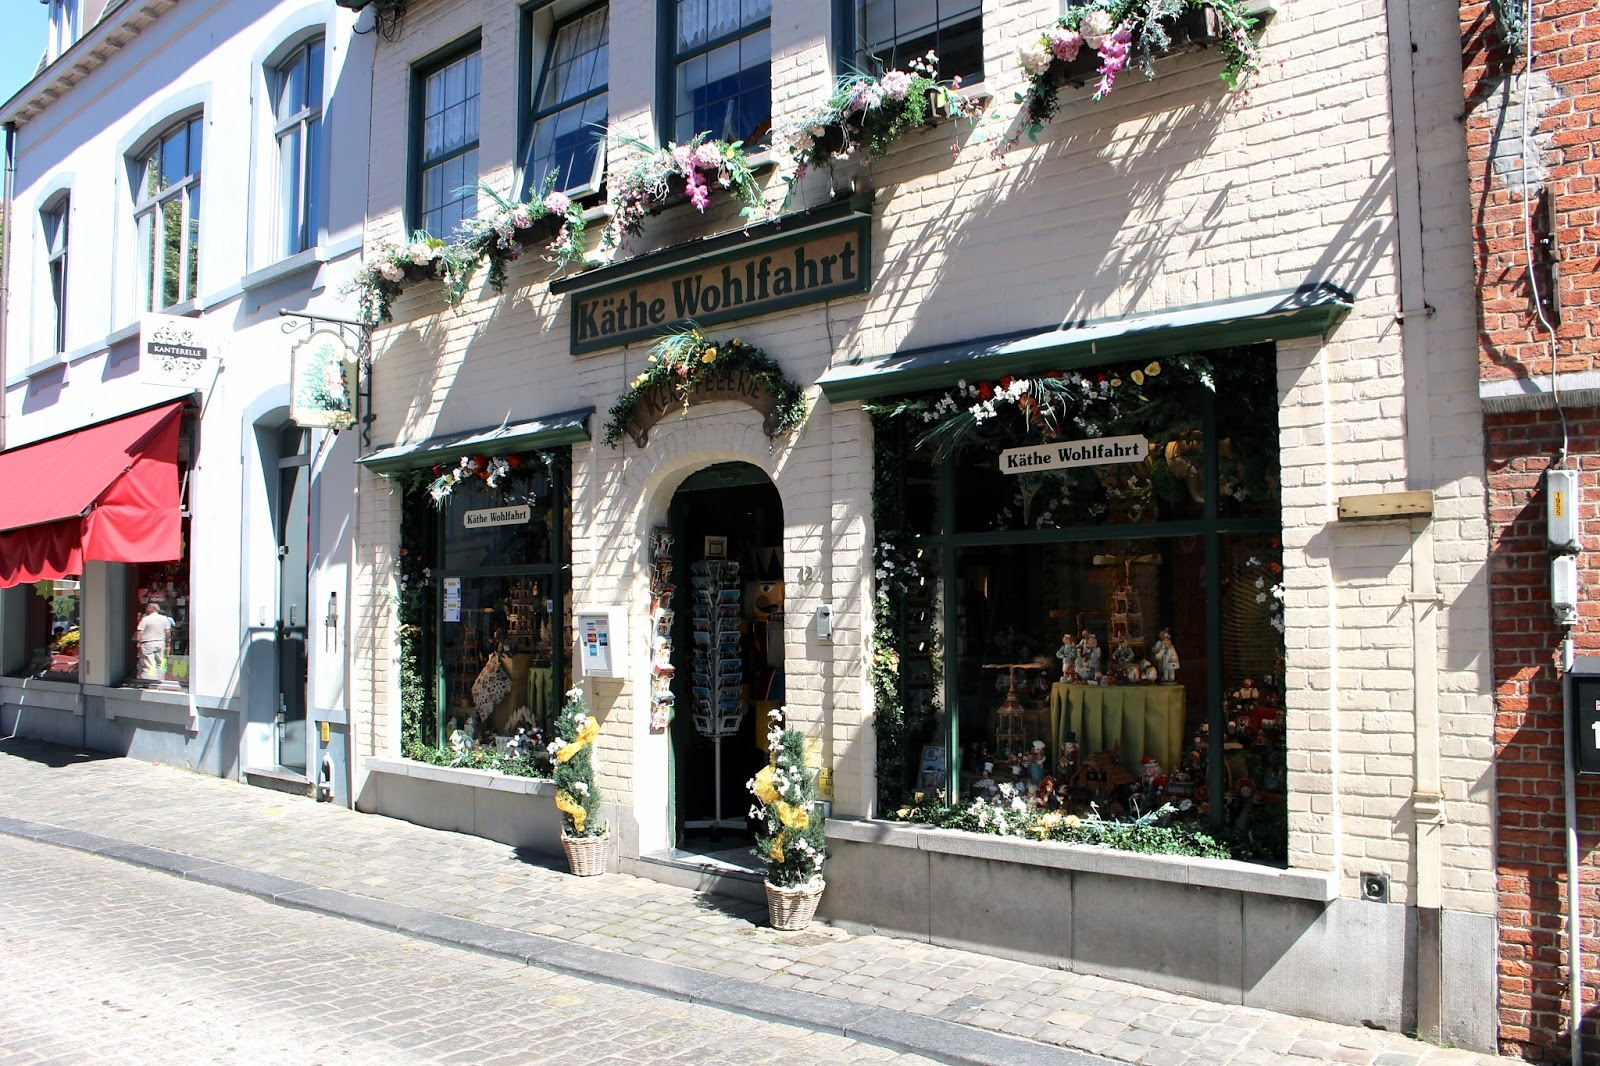 Rather Wohlfahrt shop in Bruges Belgium